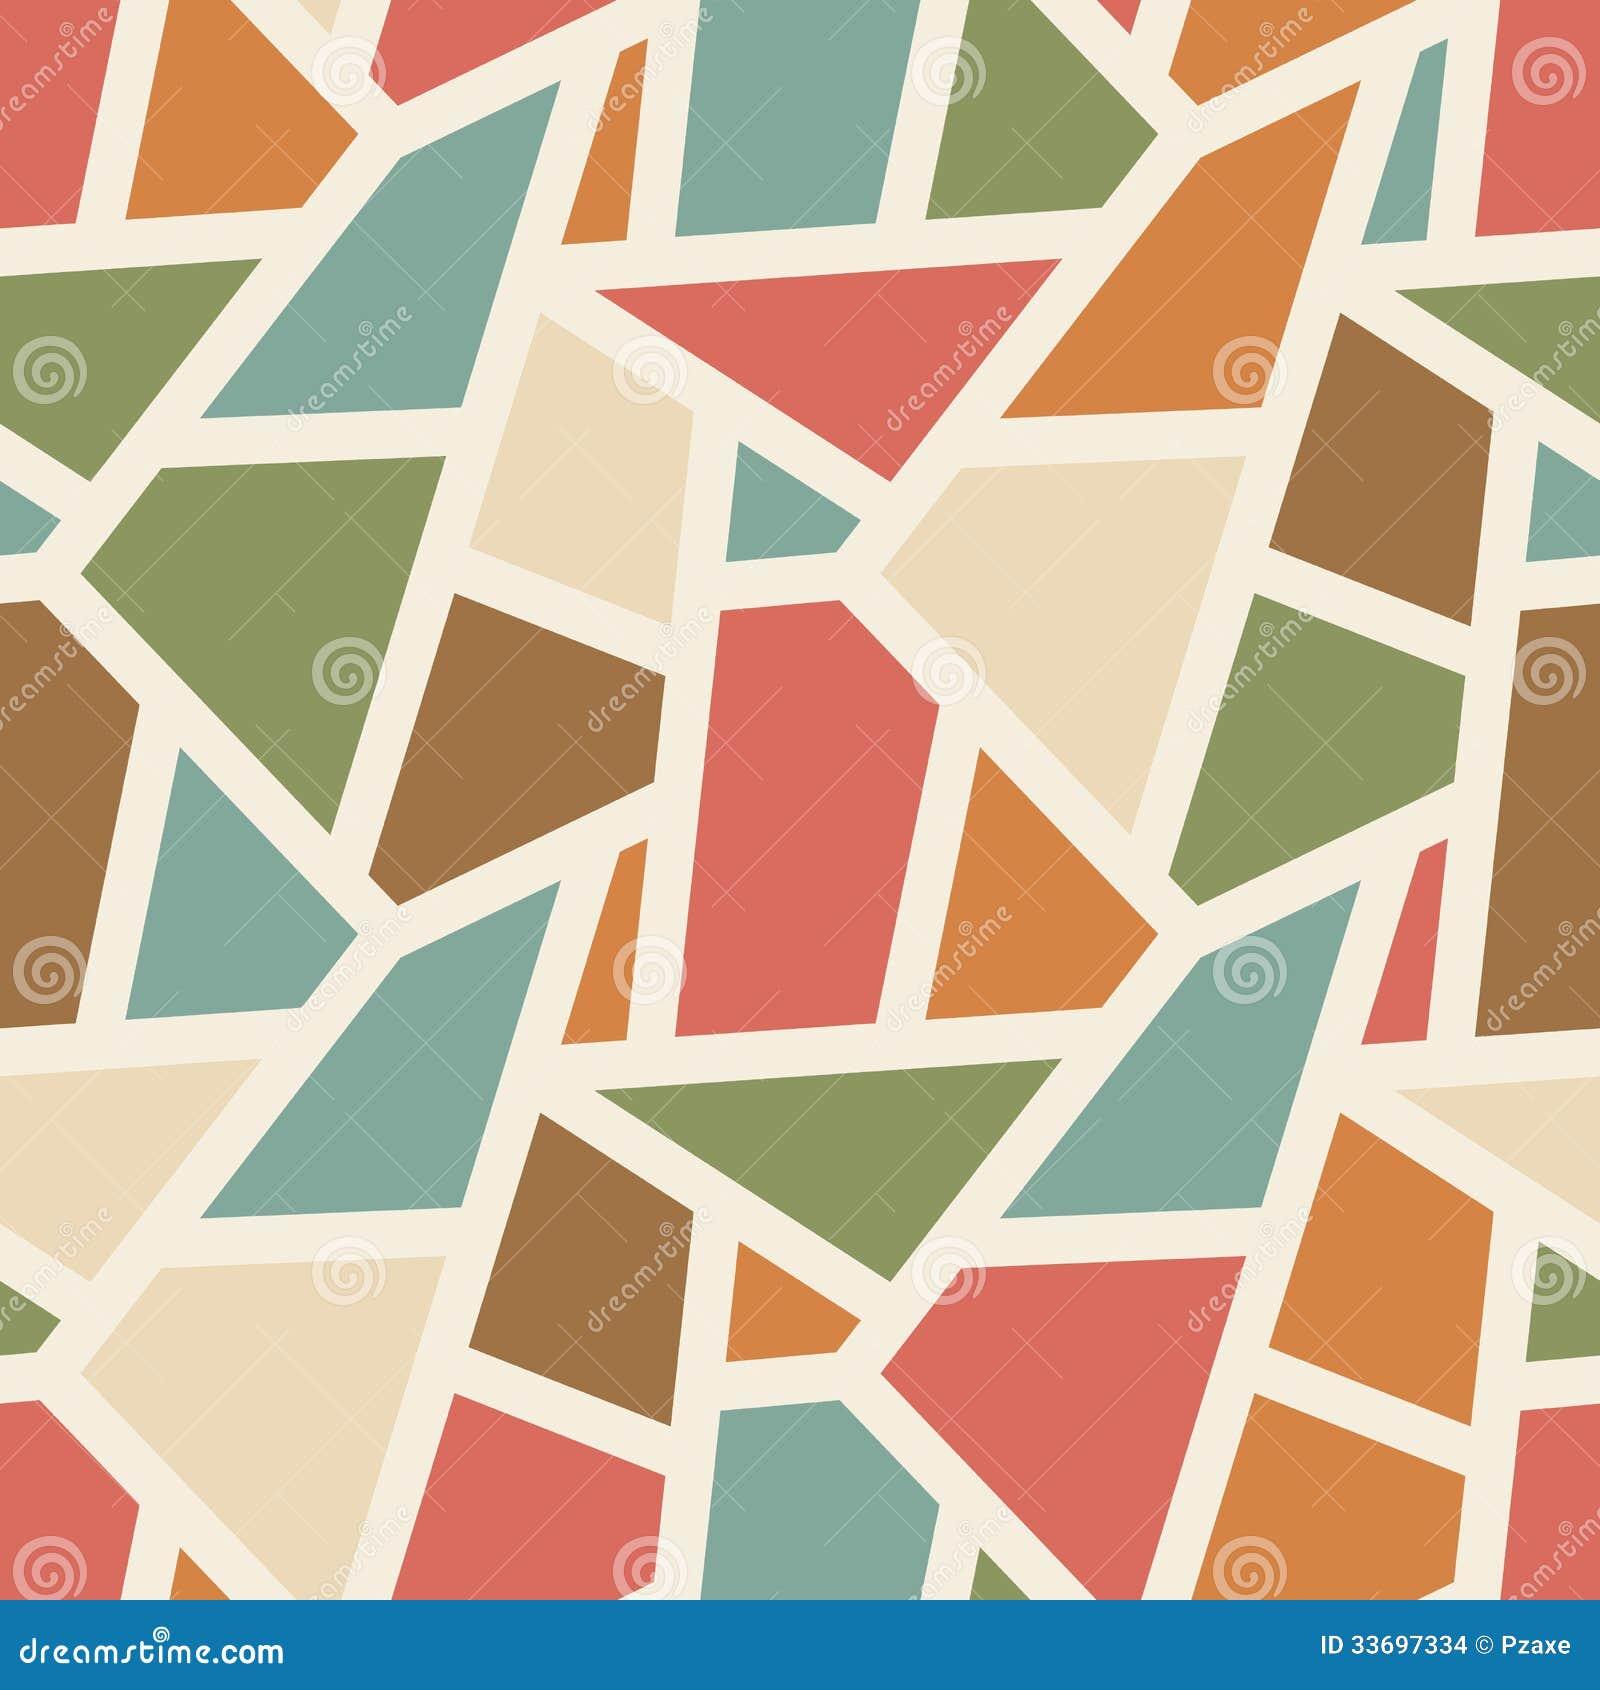 simple geometric design - photo #49